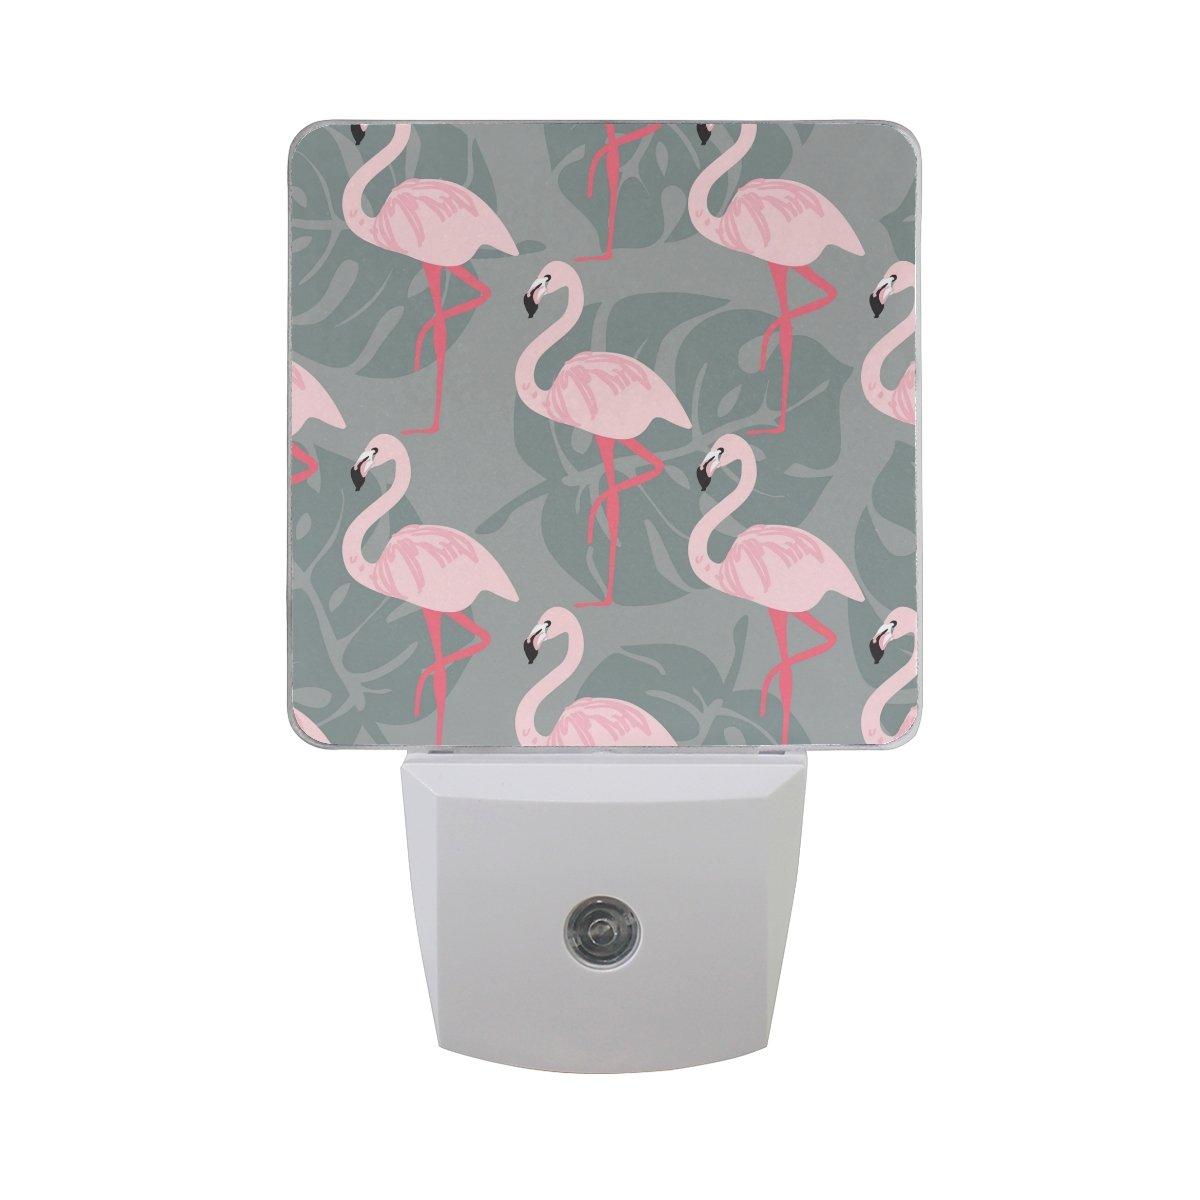 JOYPRINT Led Night Light Tropical Summer Flamingo Palm Leaves Pattern, Auto Senor Dusk to Dawn Night Light Plug in for Kids Baby Girls Boys Adults Room